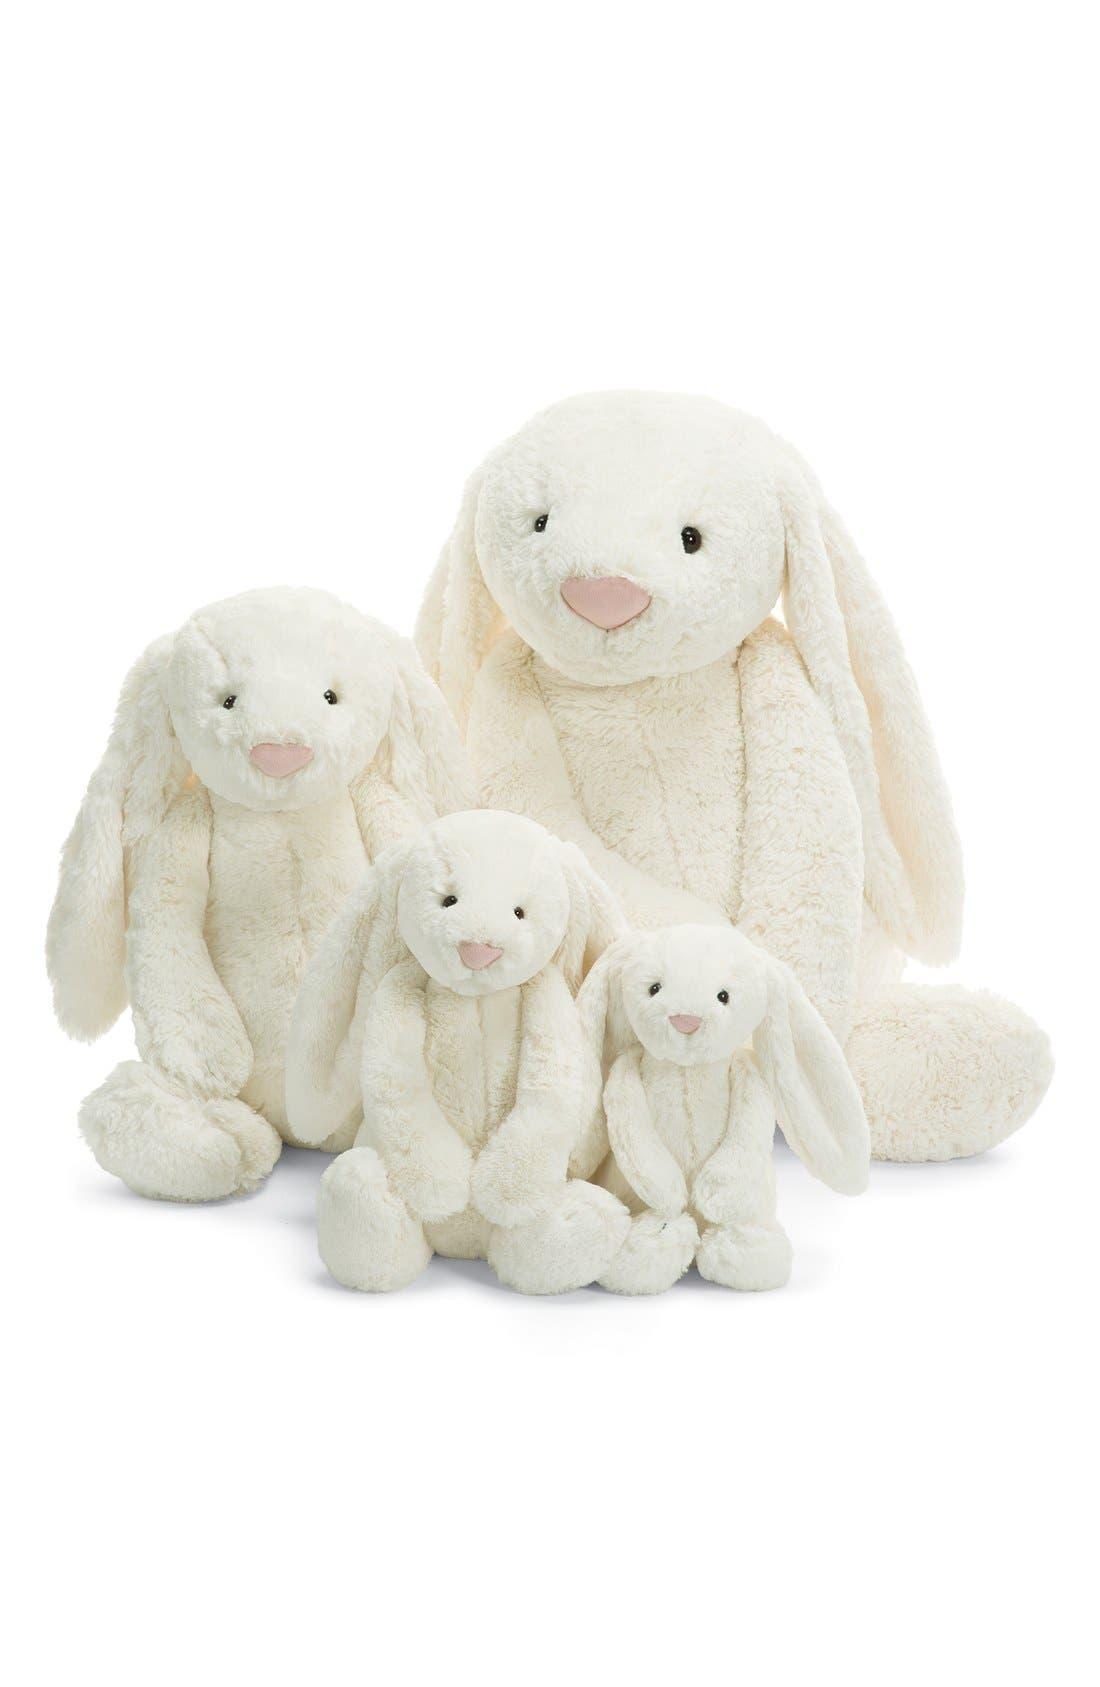 'Large Bashful Bunny' Stuffed Animal,                             Alternate thumbnail 3, color,                             900